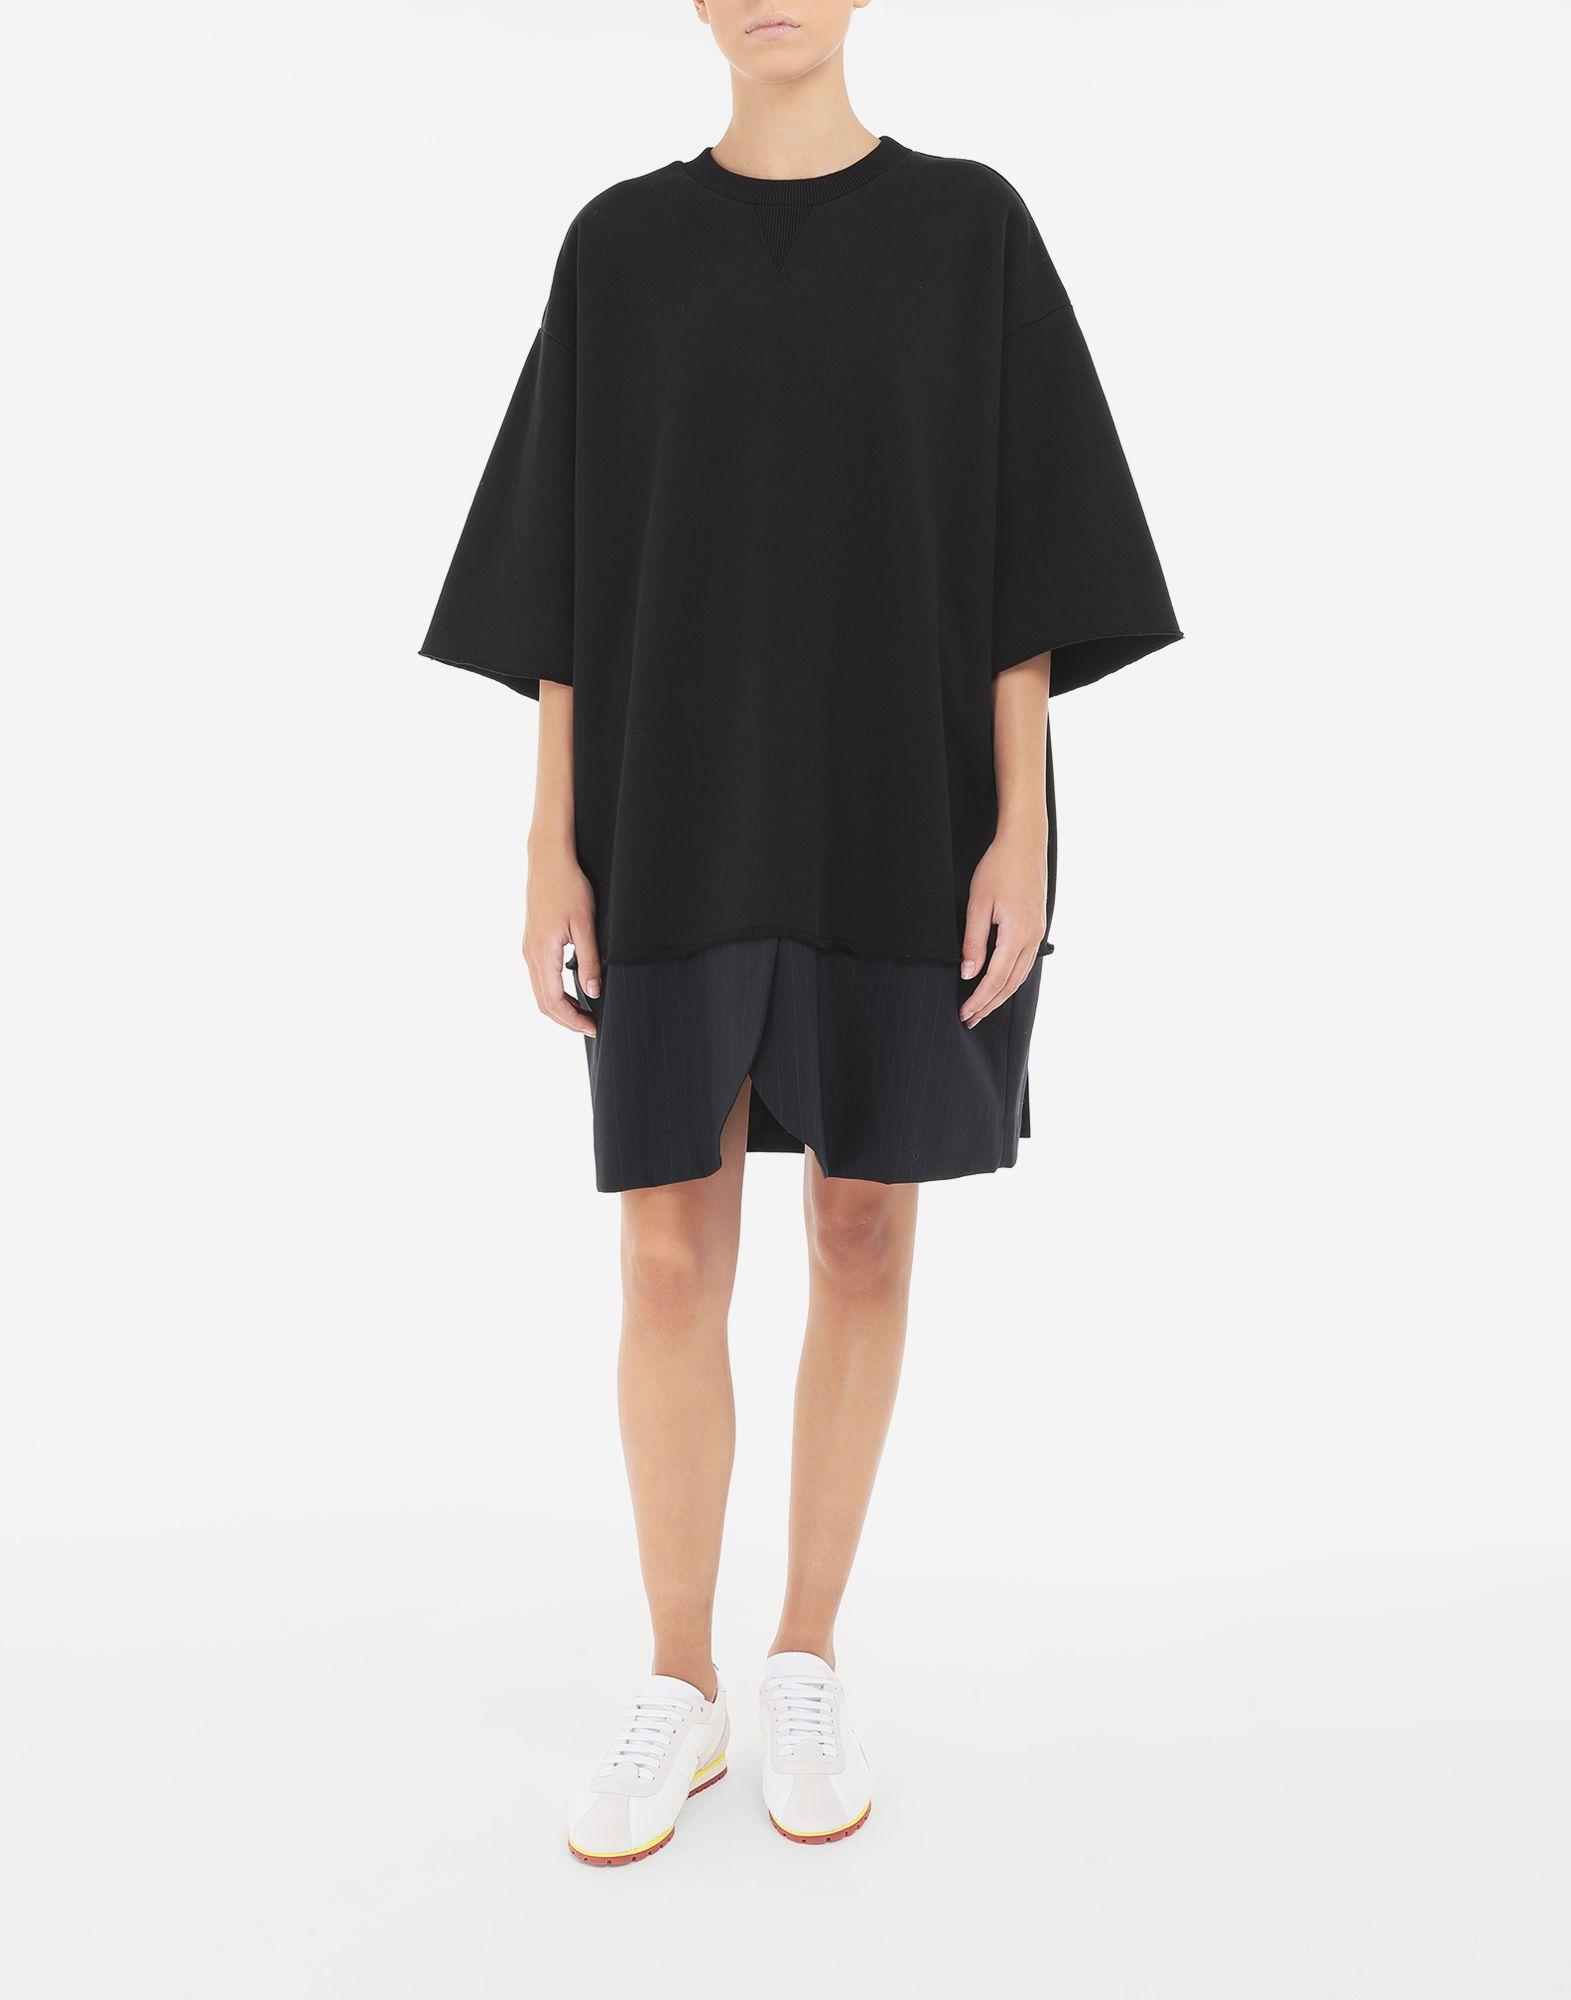 MM6 MAISON MARGIELA Vestido camisero Spliced Minivestido Mujer r